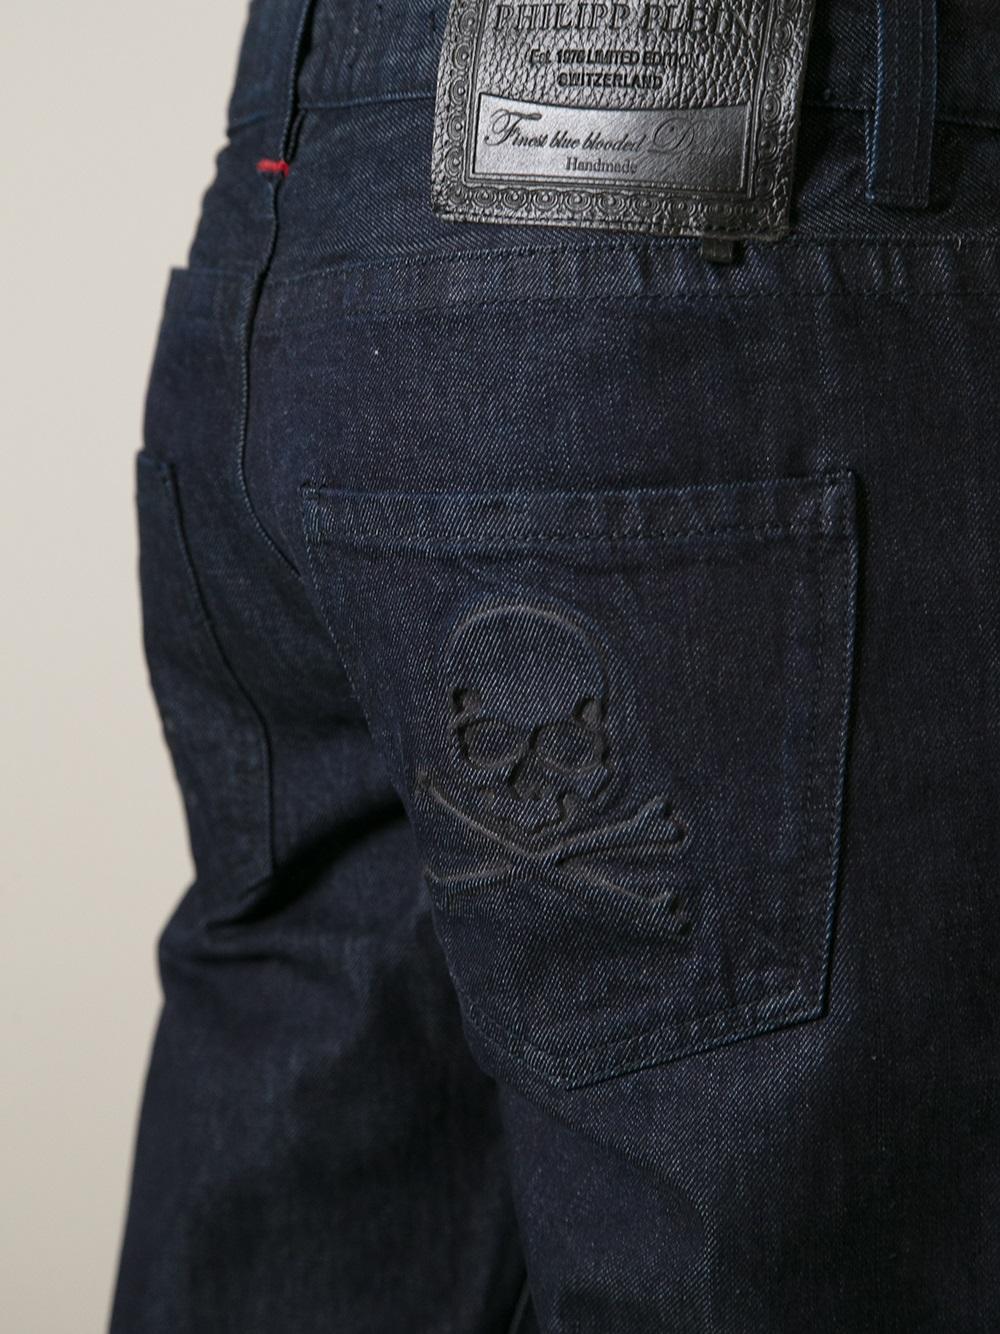 philipp plein denim jean in blue for men lyst. Black Bedroom Furniture Sets. Home Design Ideas